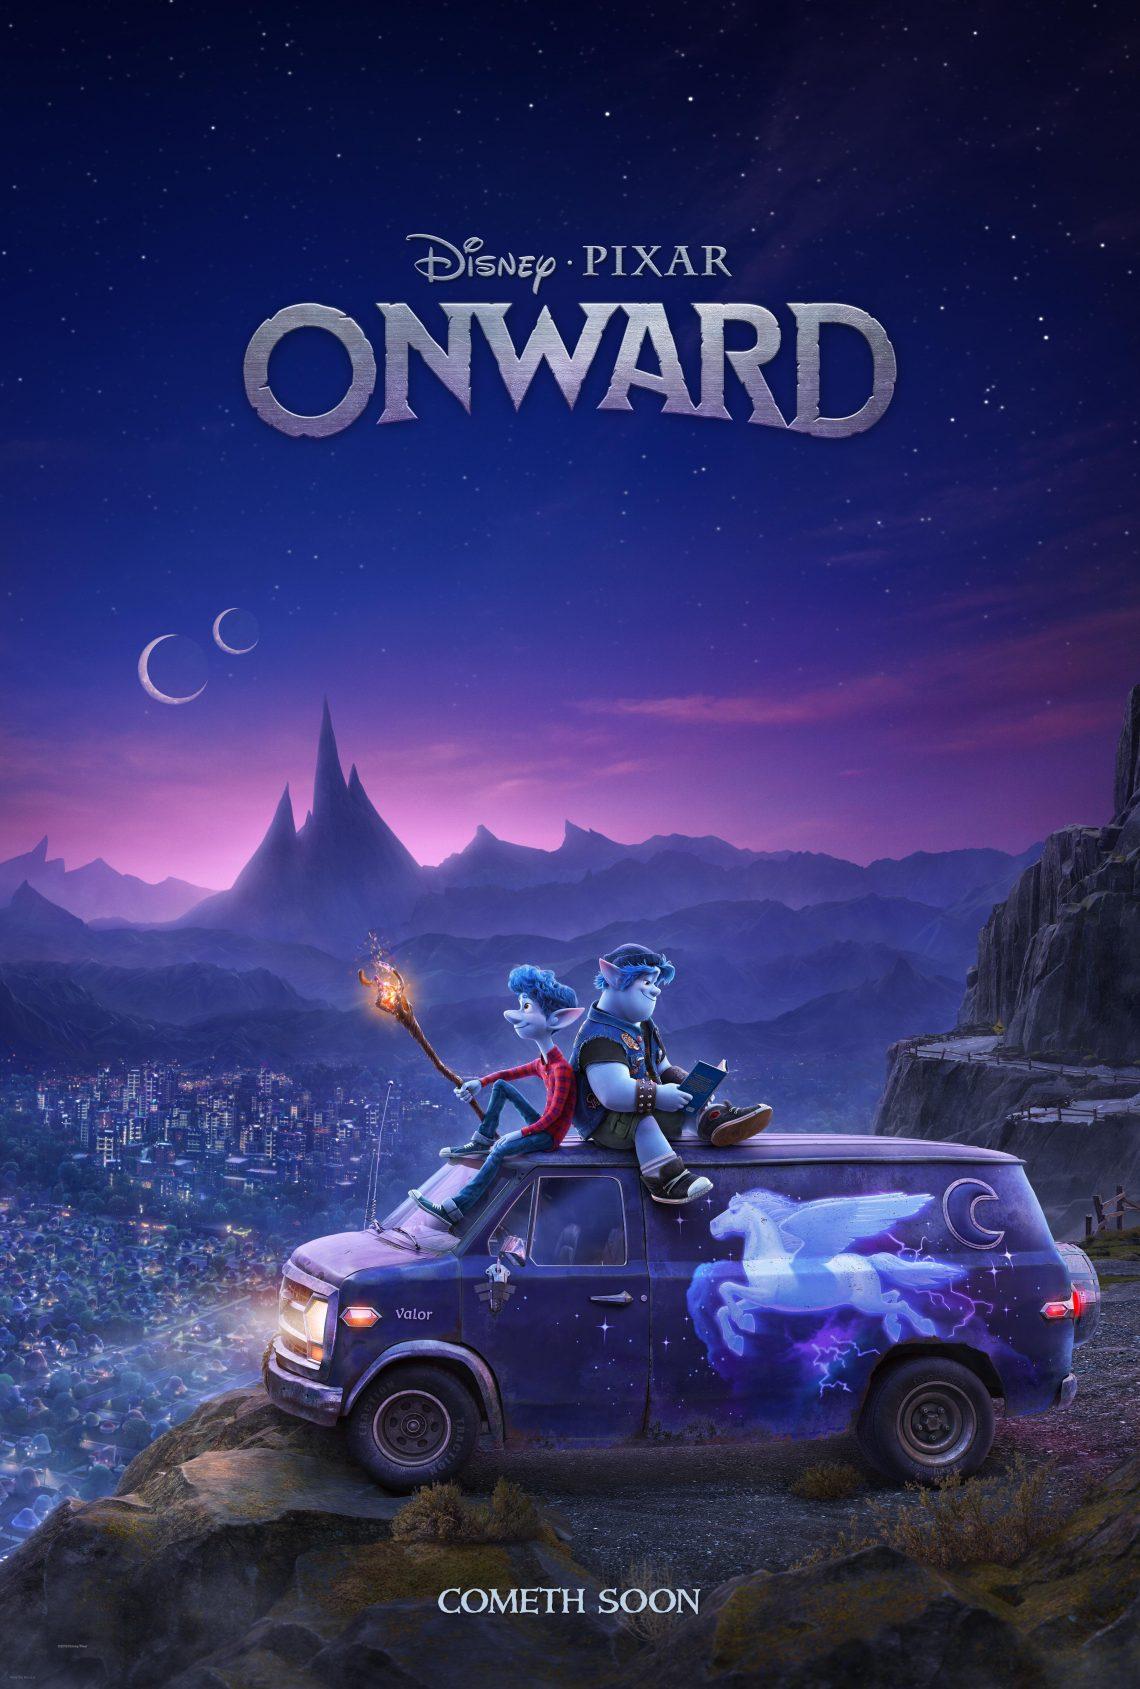 Disney and Pixar's Onward